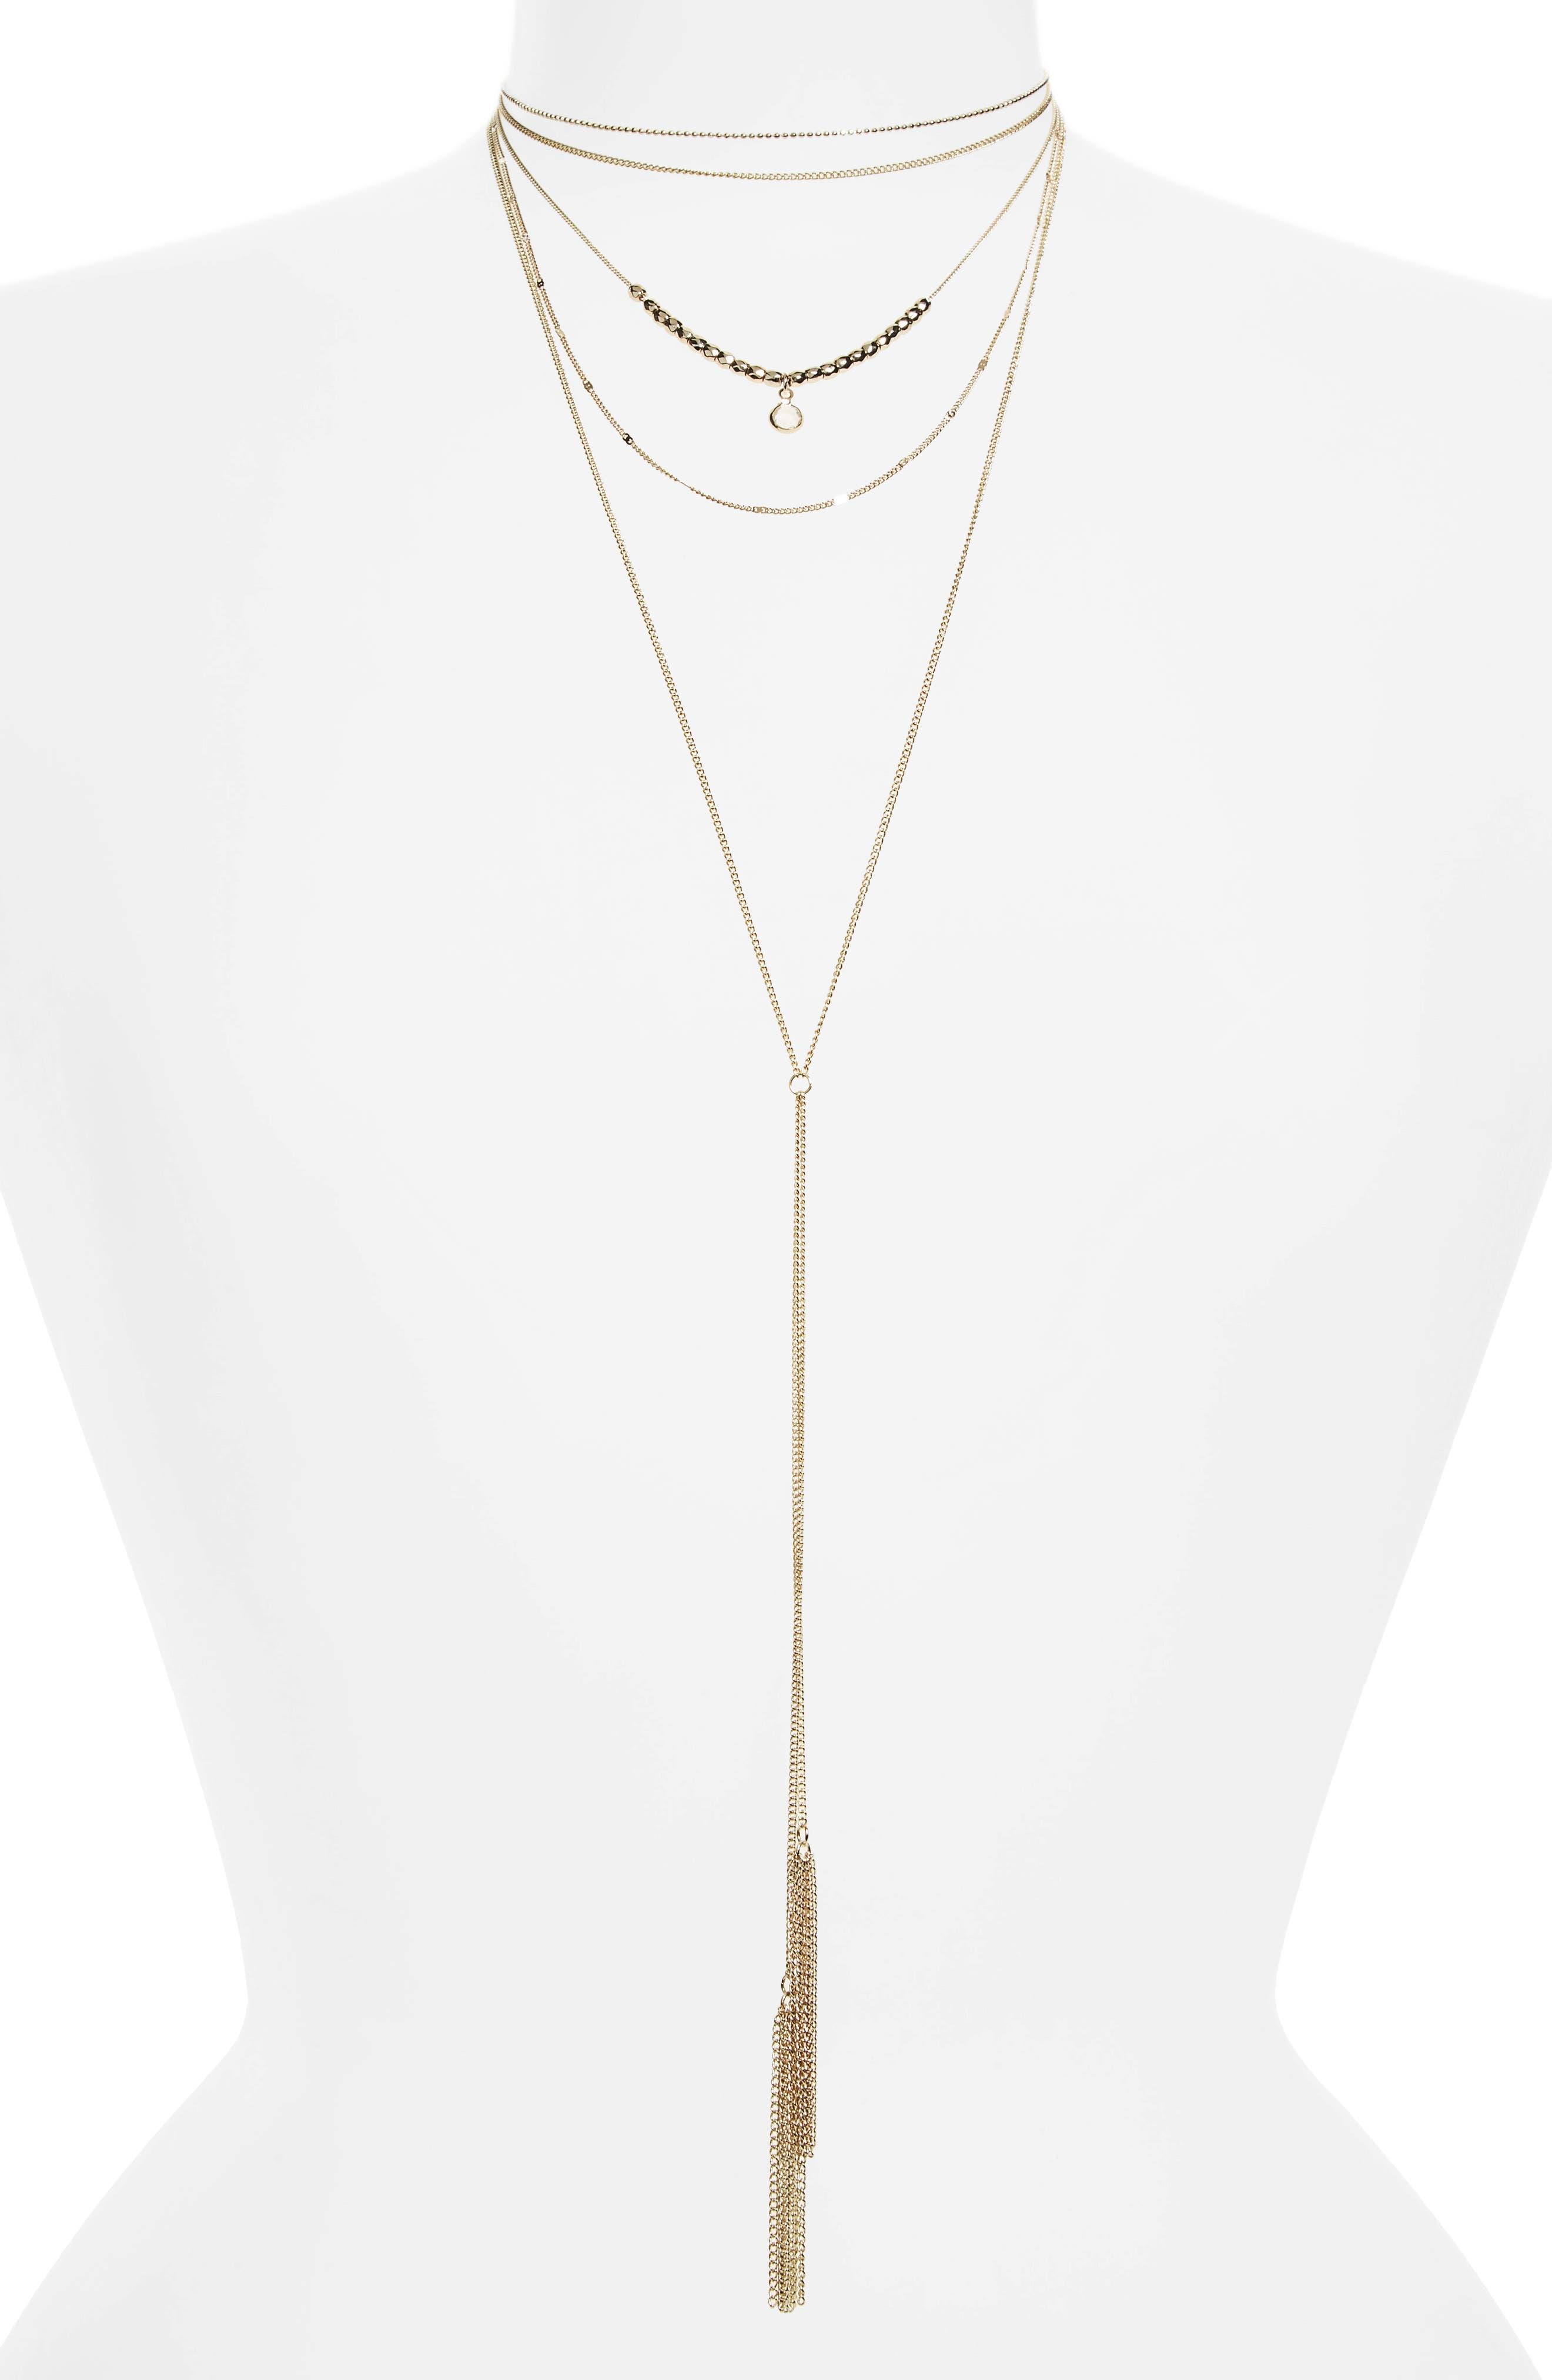 TOPSHOP,                             Multistrand Tassel Necklace,                             Main thumbnail 1, color,                             710